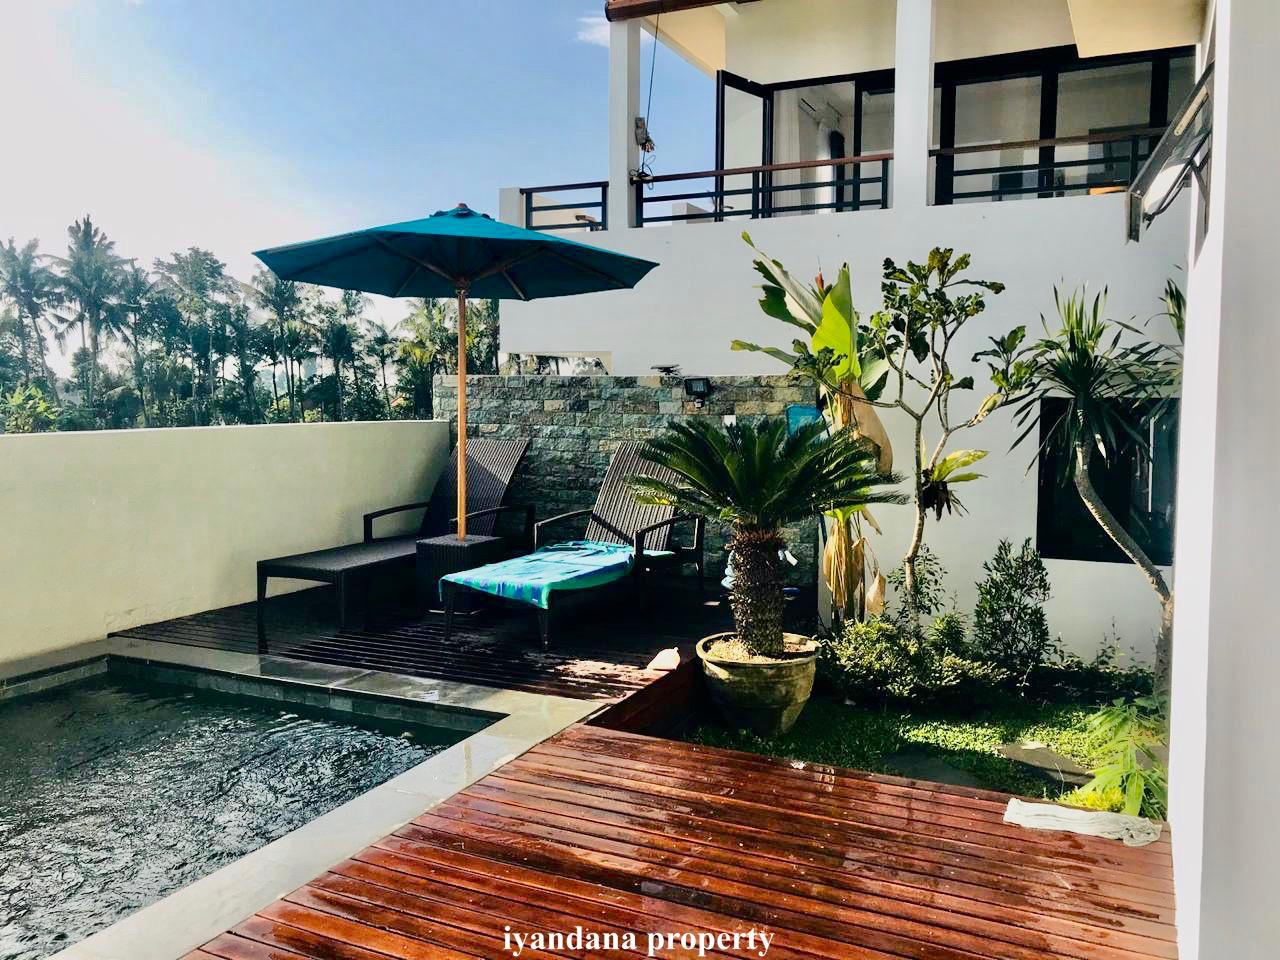 Rent sewa ID:B-13 villa ubud gianyar bali near central ubud